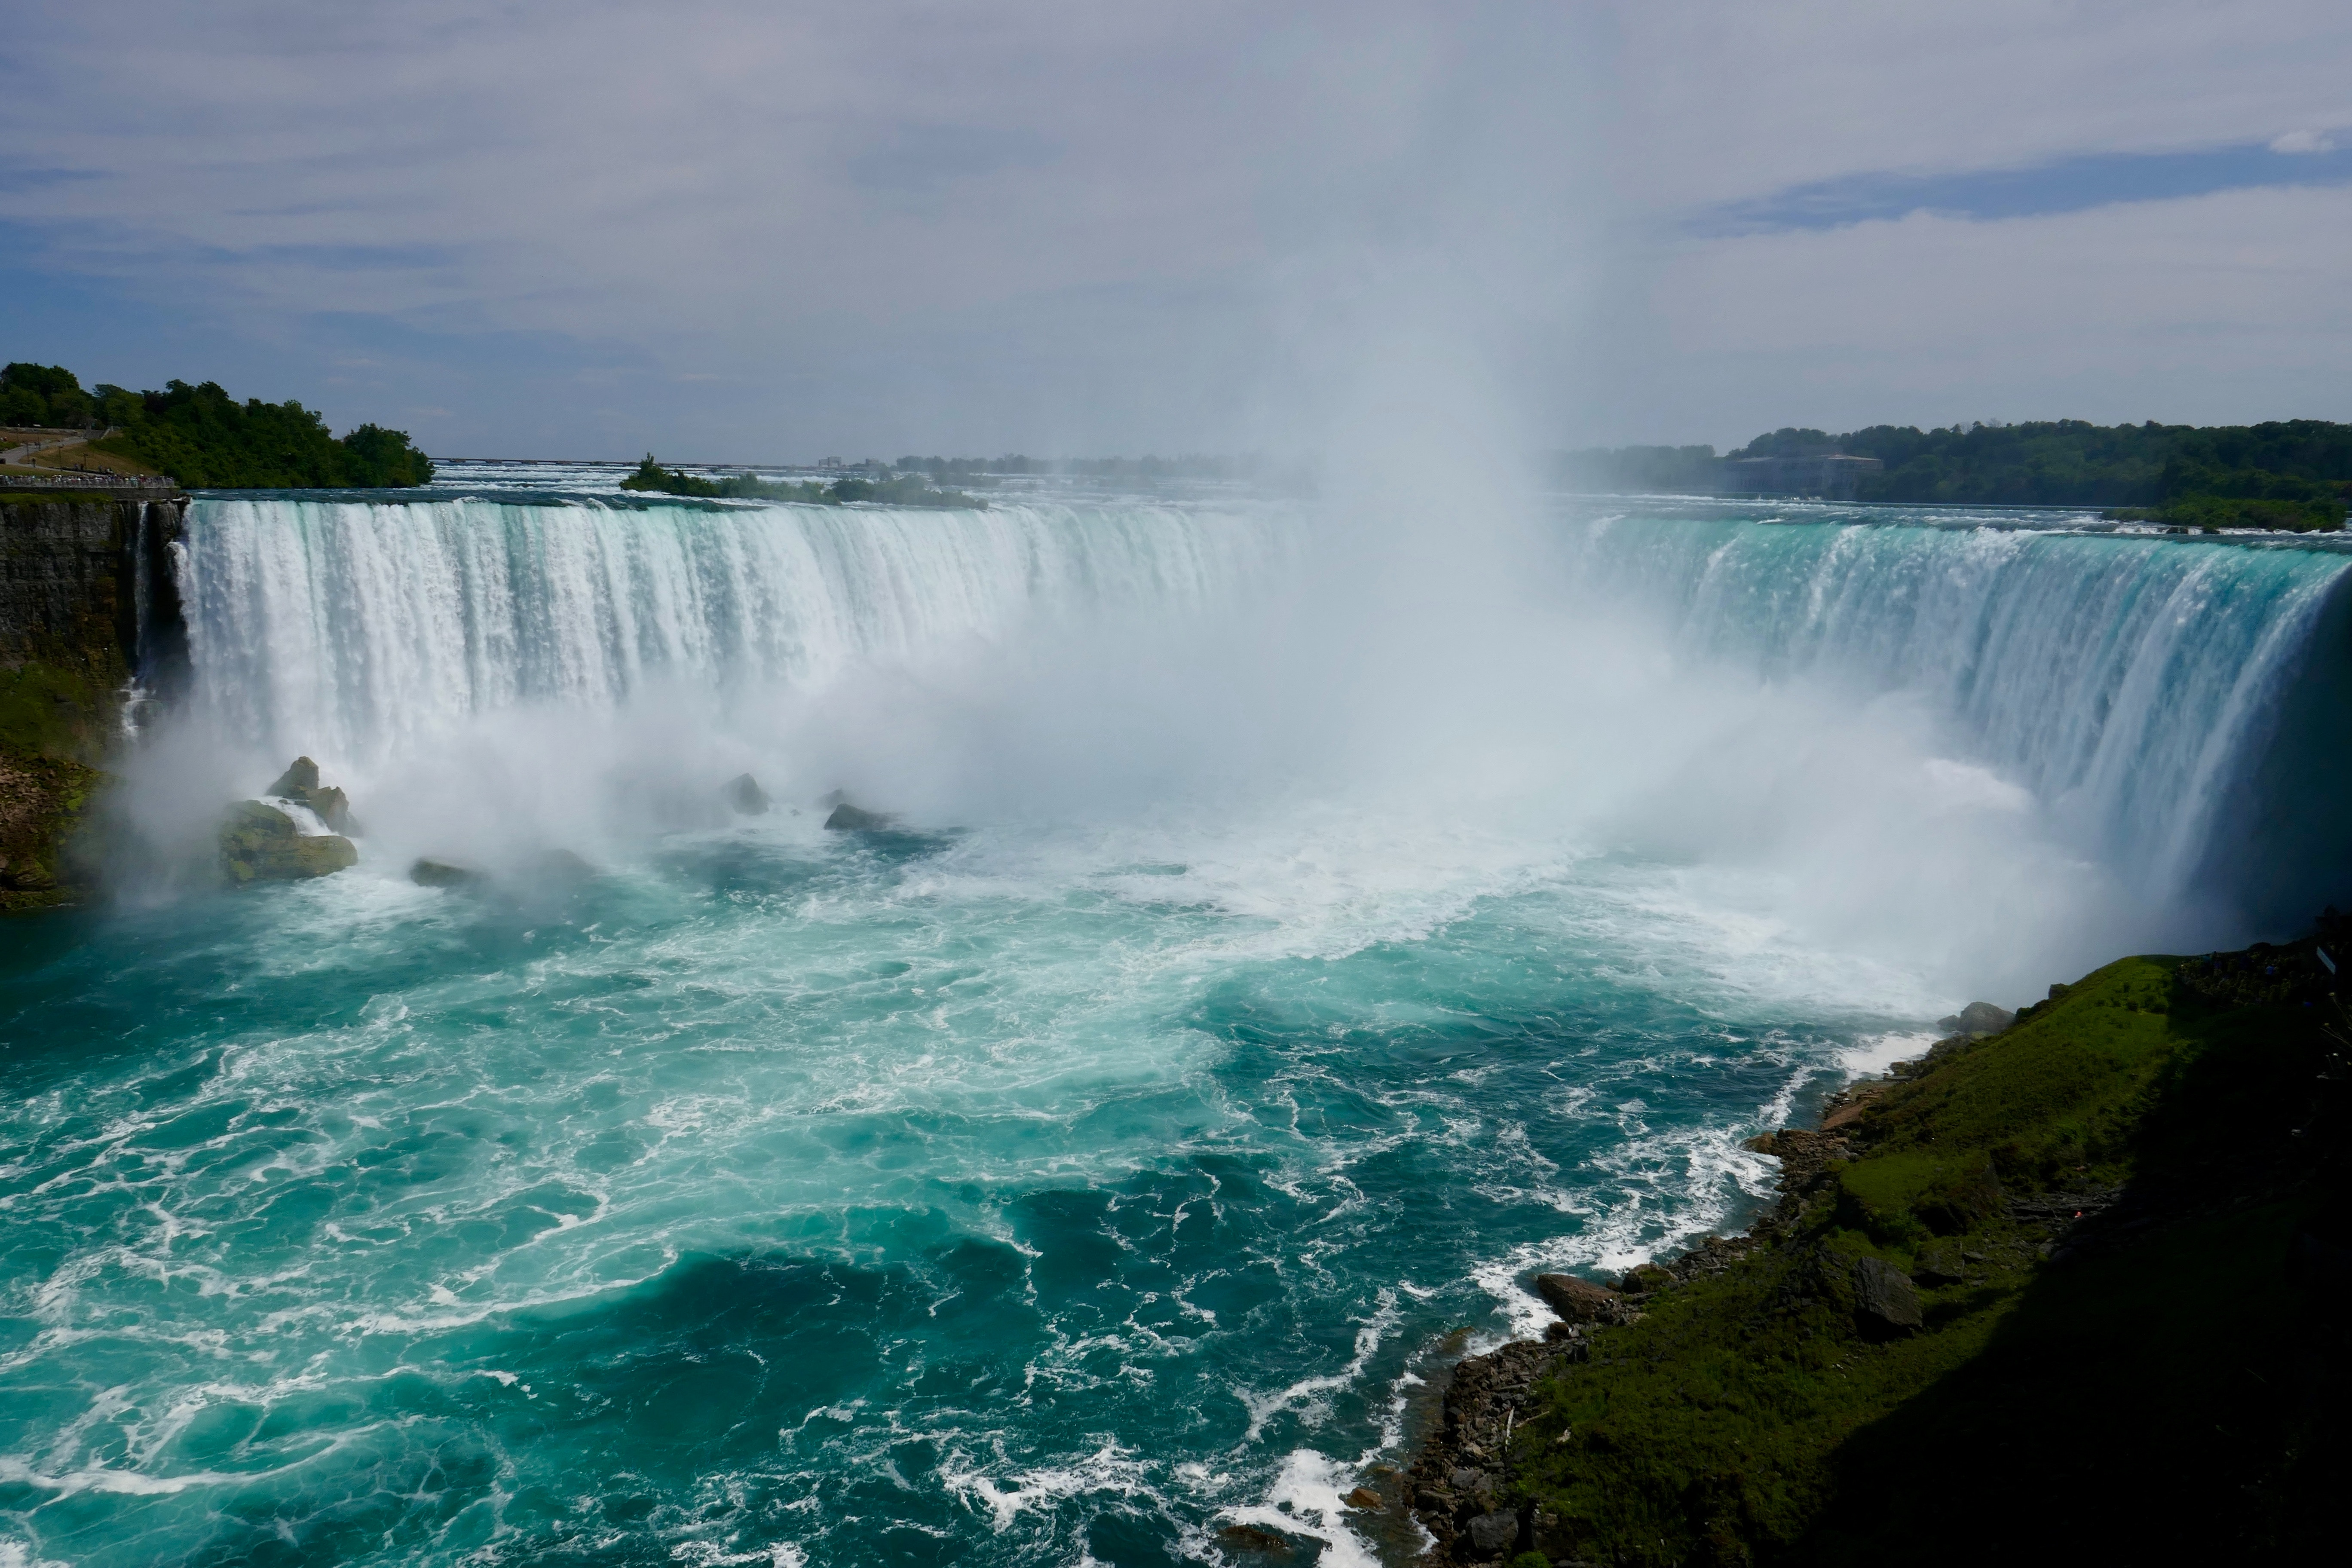 Cascate del Niagara, foto di Edward Koorey, via Unsplash